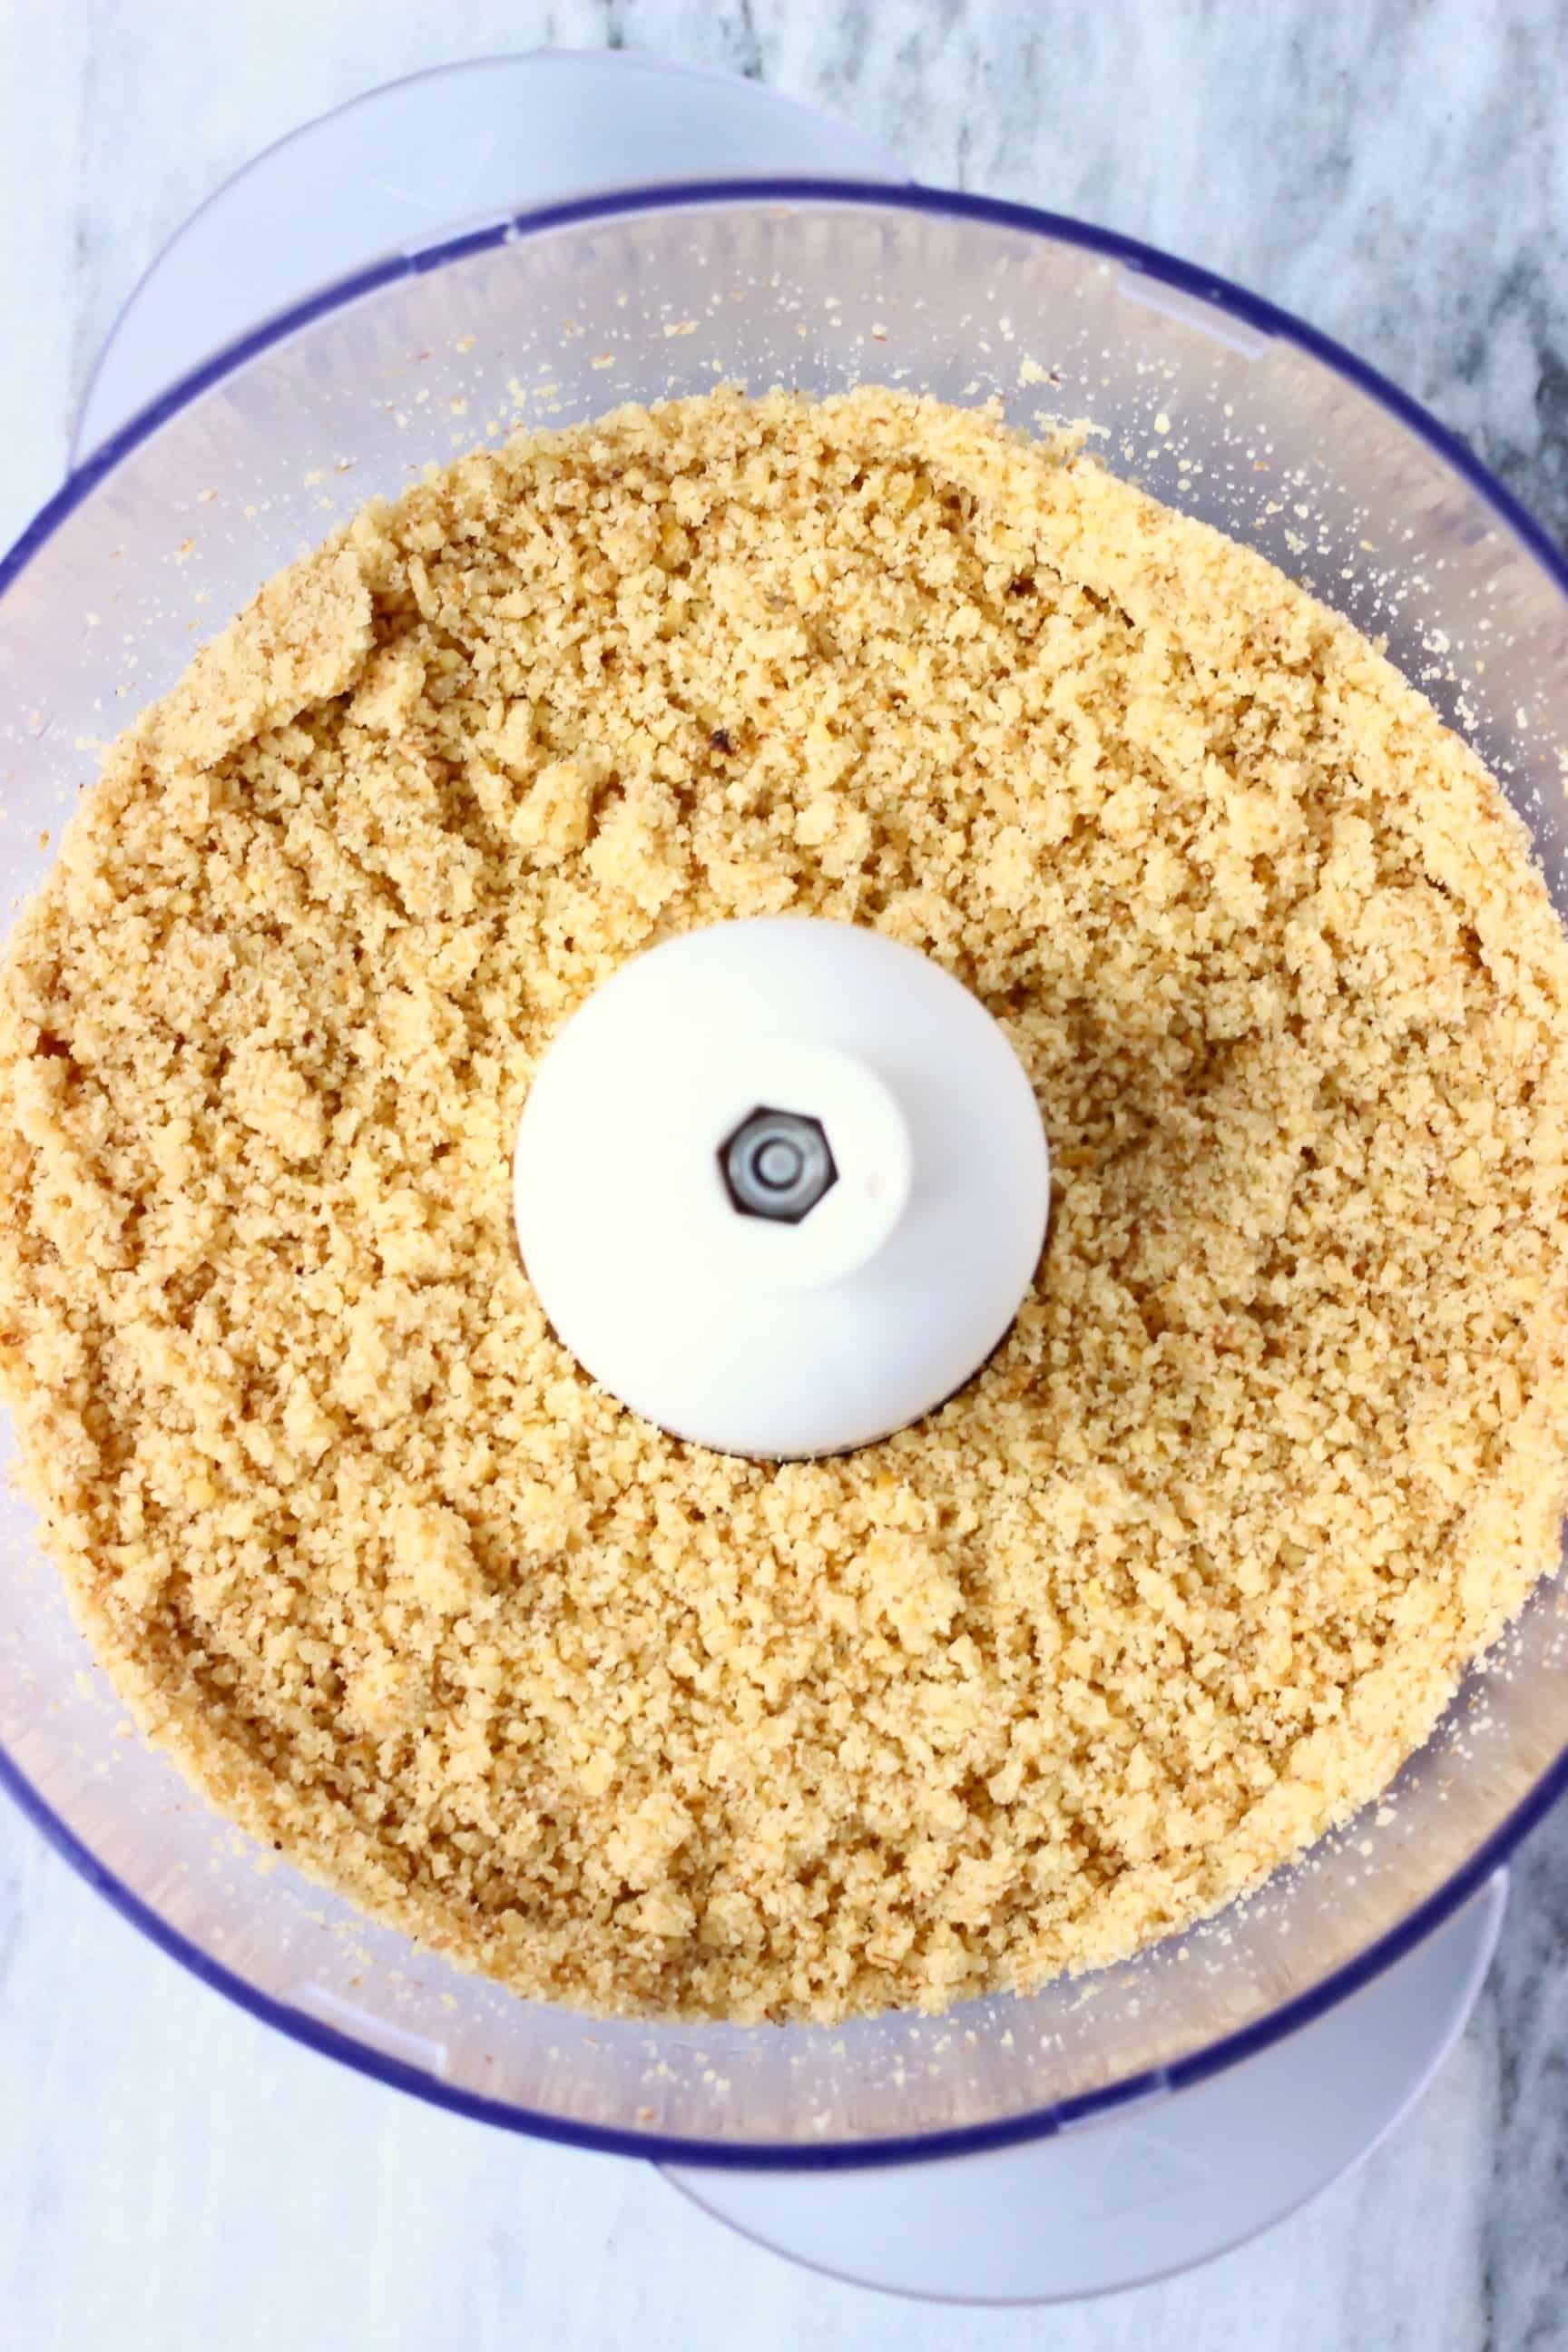 Ground walnuts in a food processor